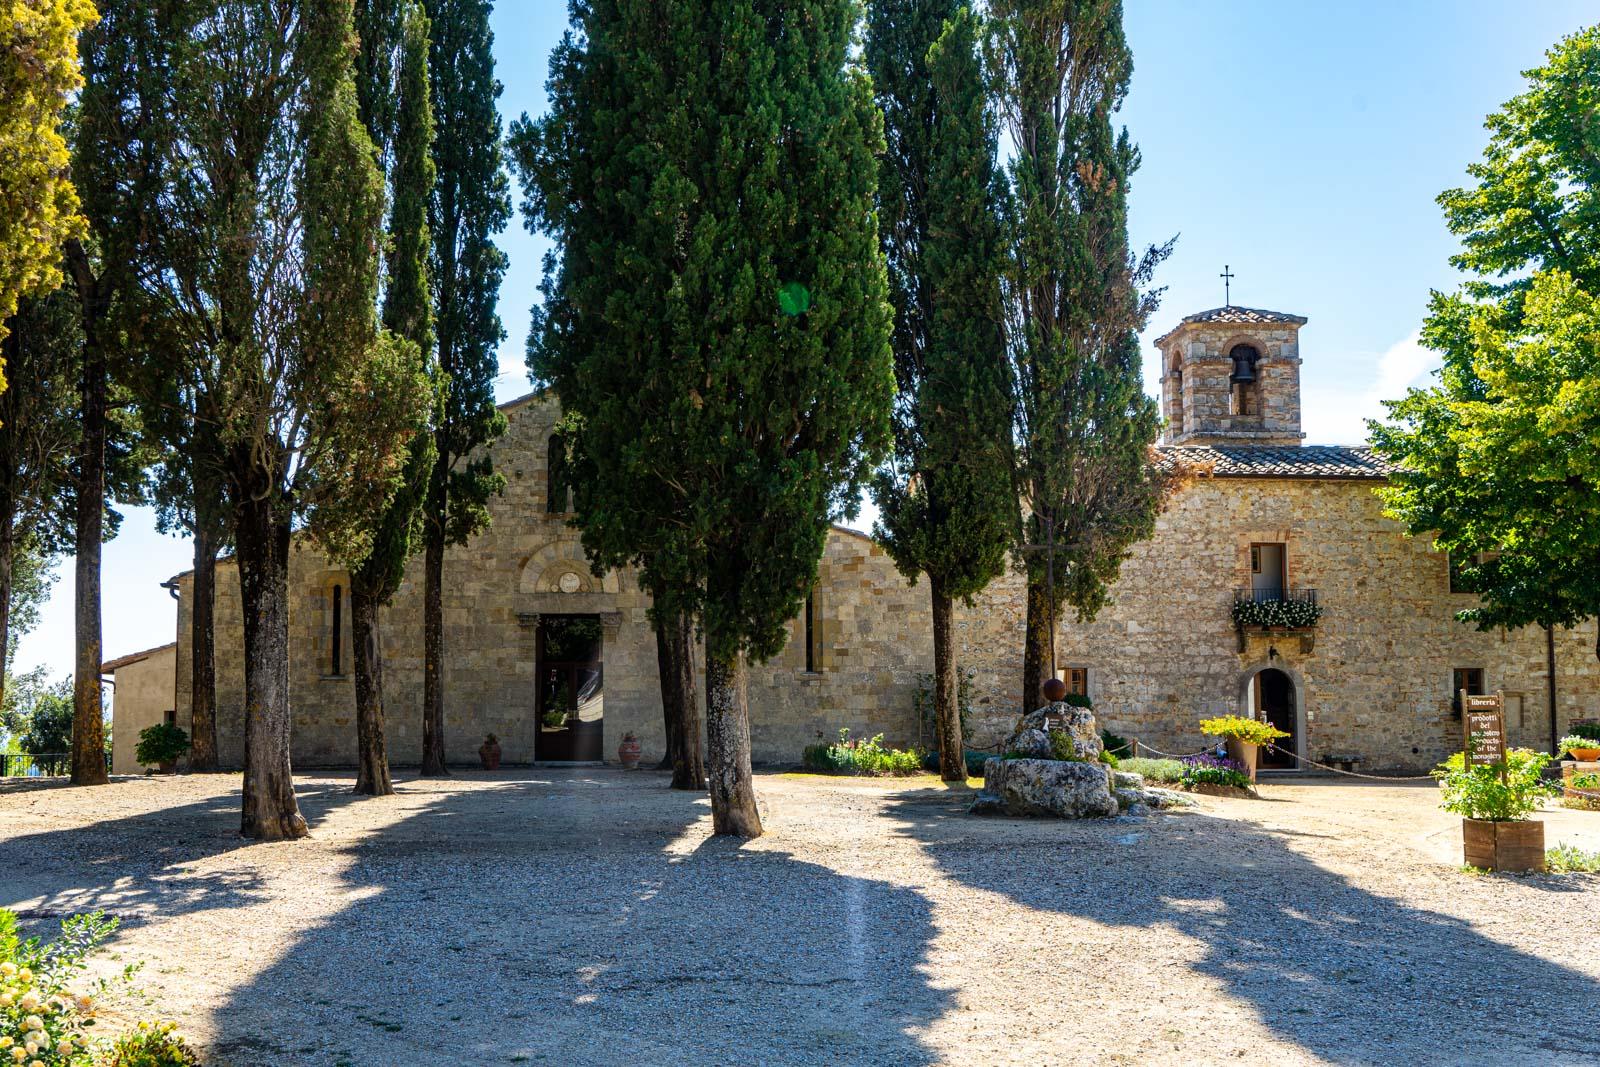 Monastery of Bose, near San Gimignano